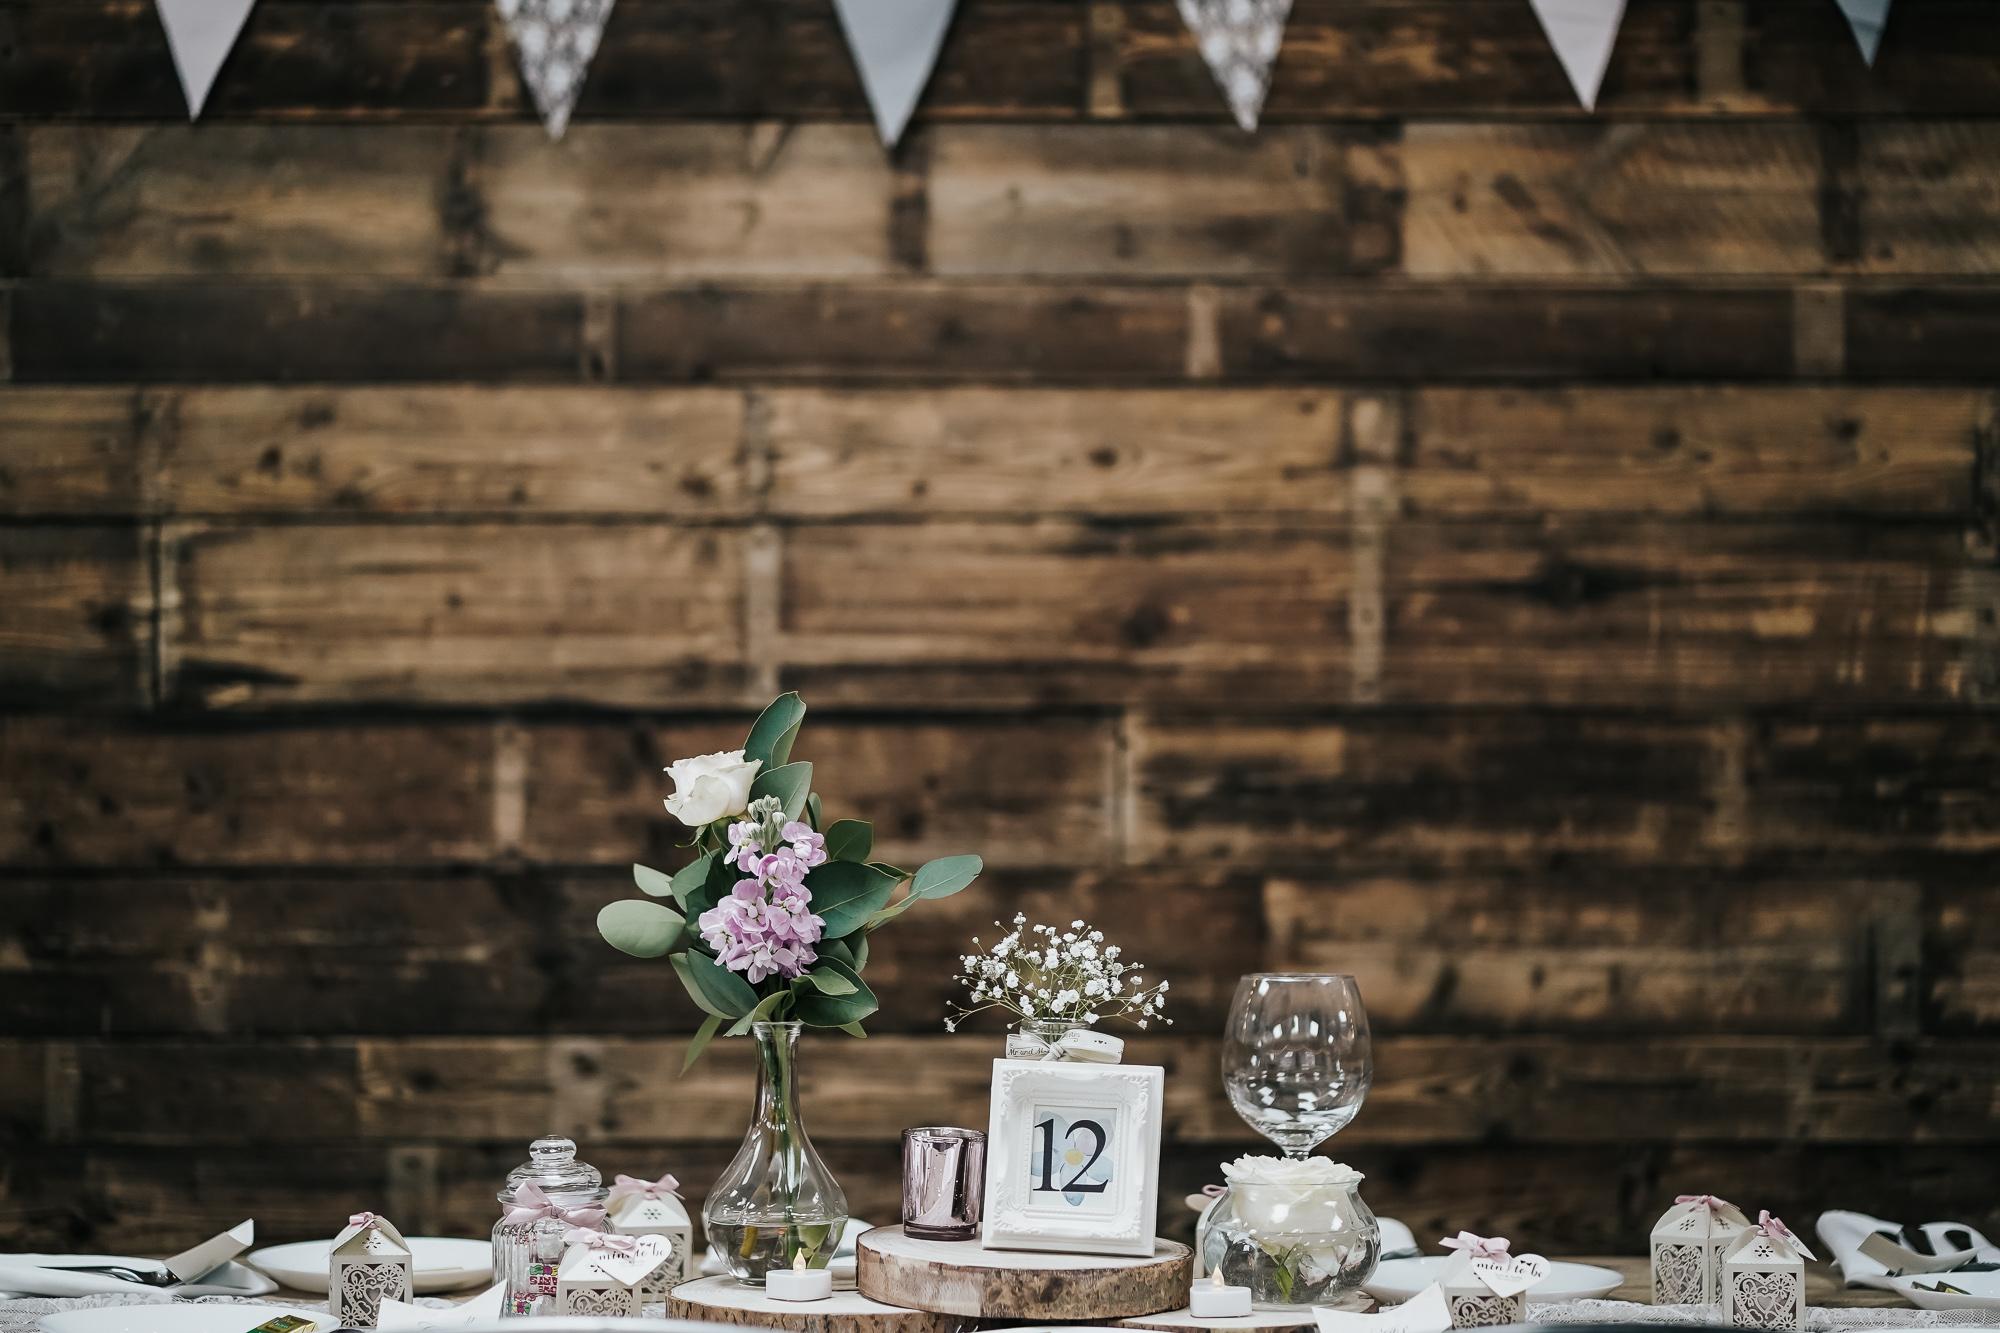 The Hayloft Wedding Photography Cheshire wedding photographer (29 of 52).jpg